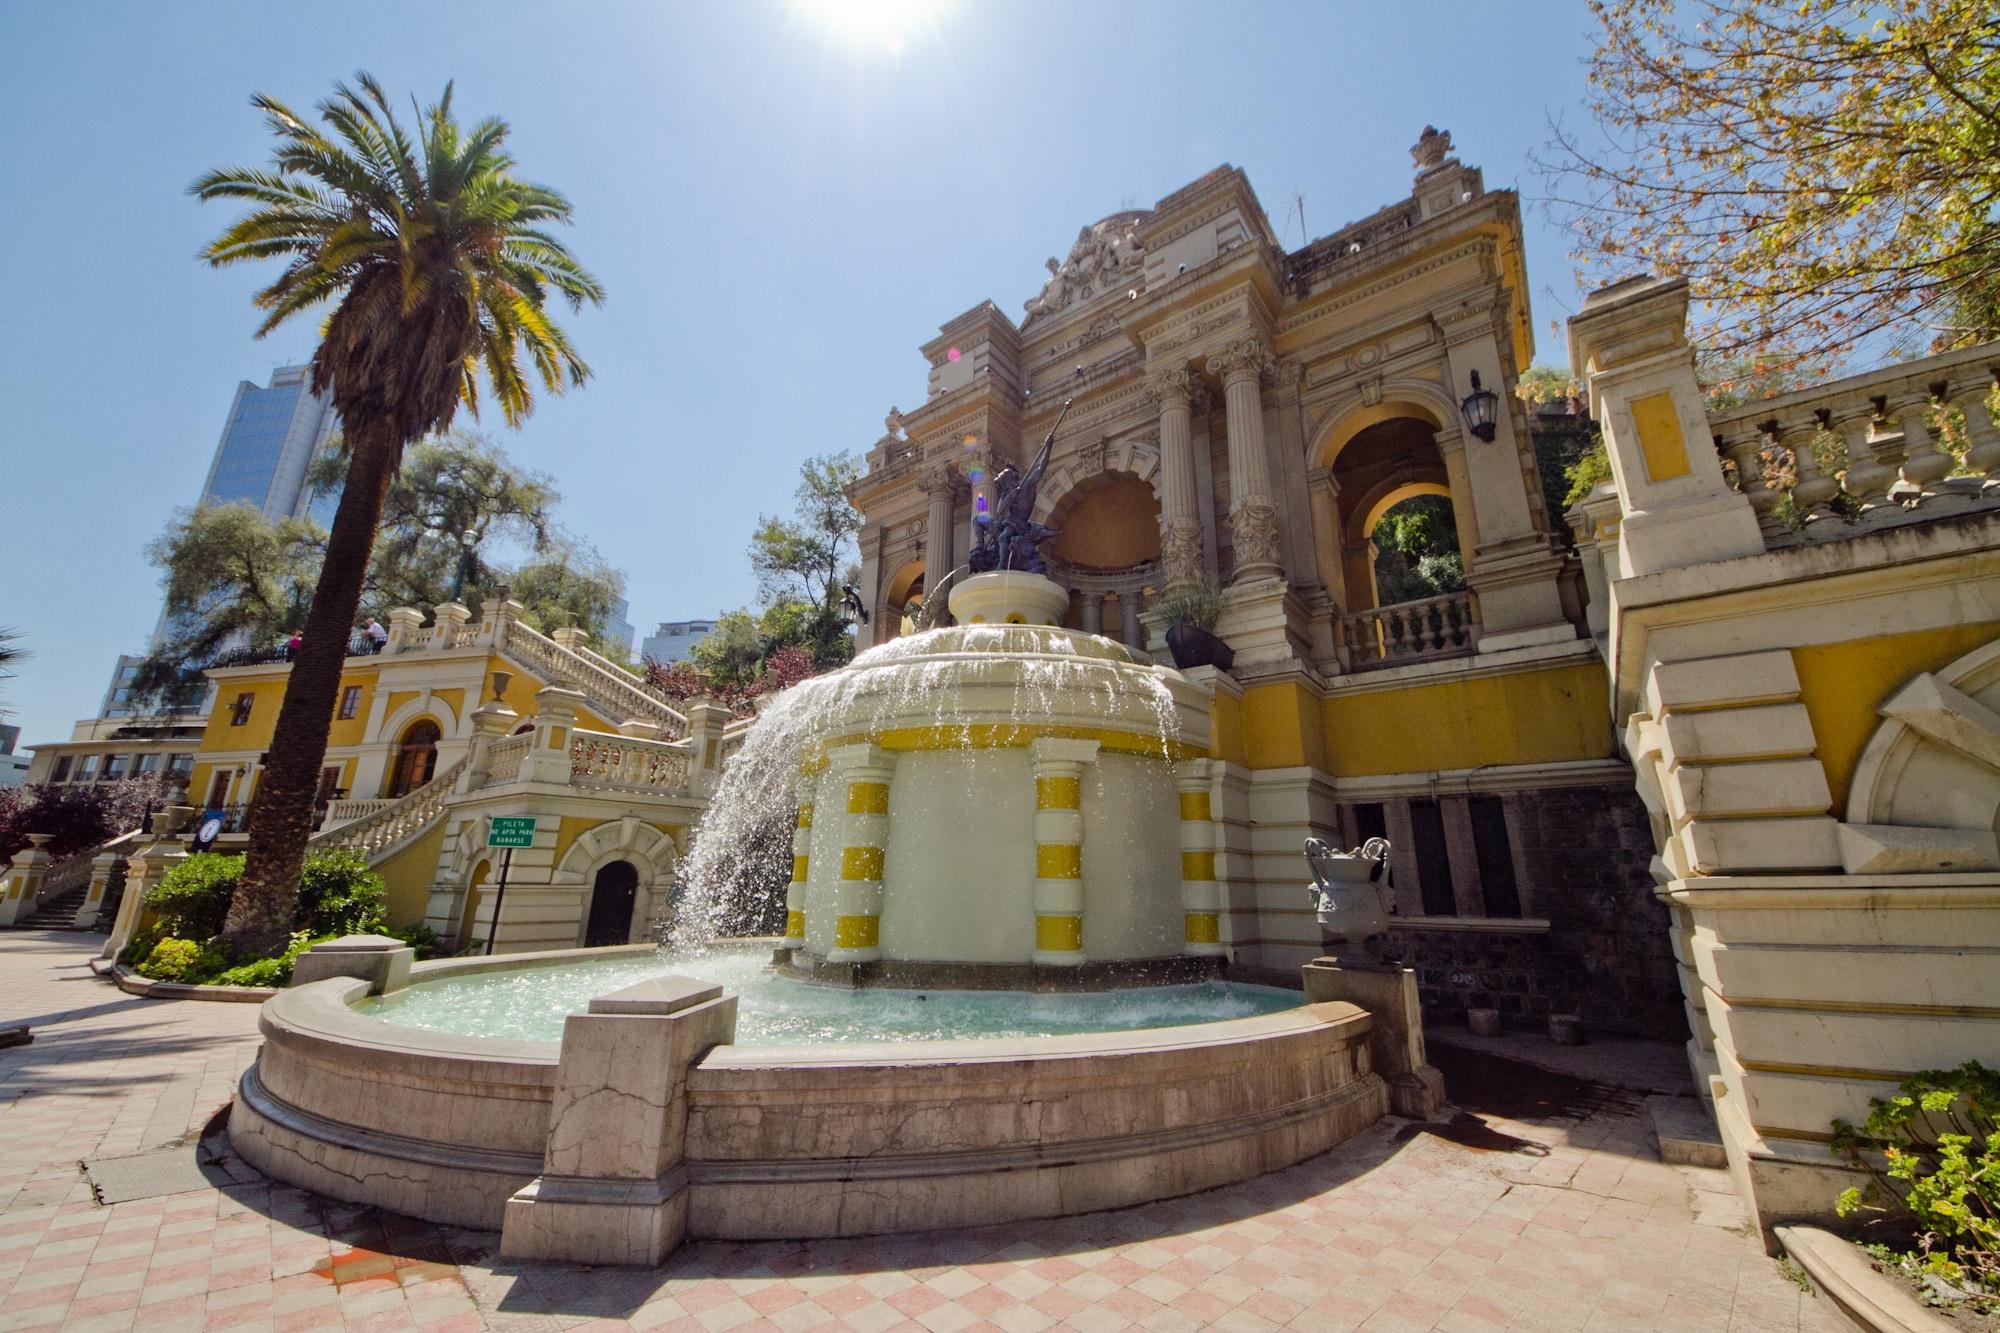 Escola cintia martins cerro santa luc a chile for Construccion de piscinas santiago chile